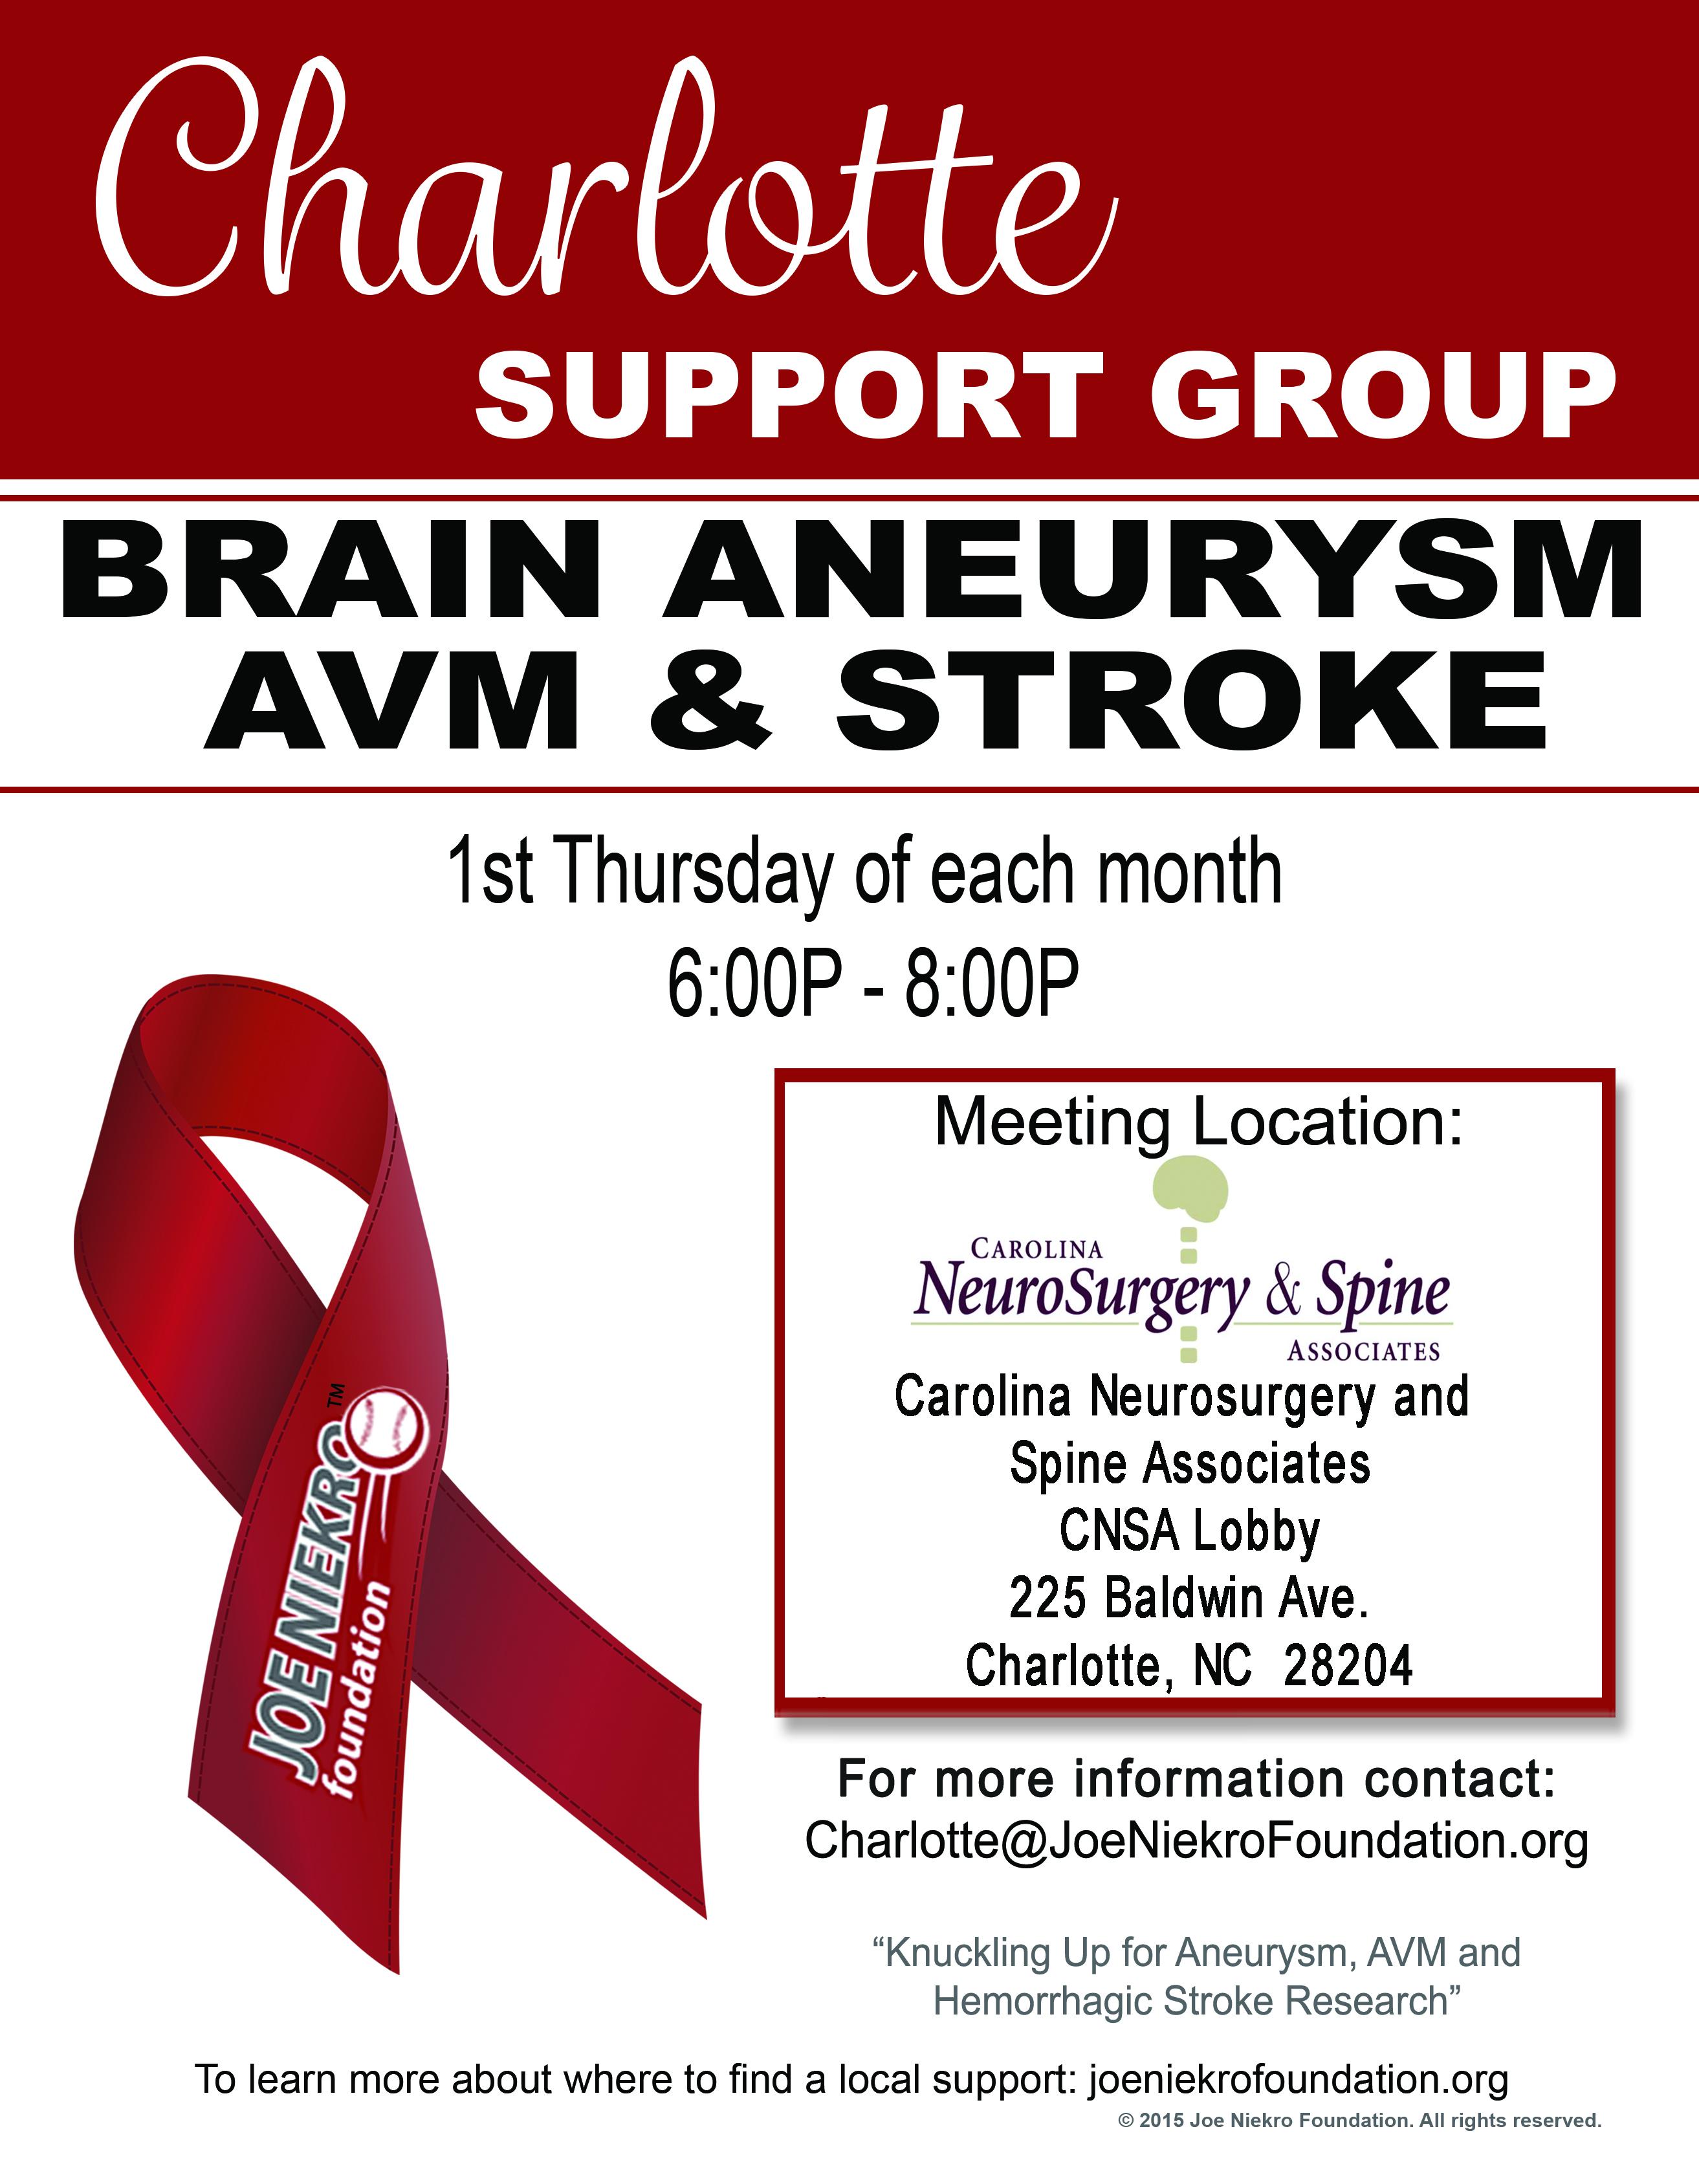 https://www.joeniekrofoundation.com/patient-caregiver-support/support-groups/locations/attachment/charlotte-poster/